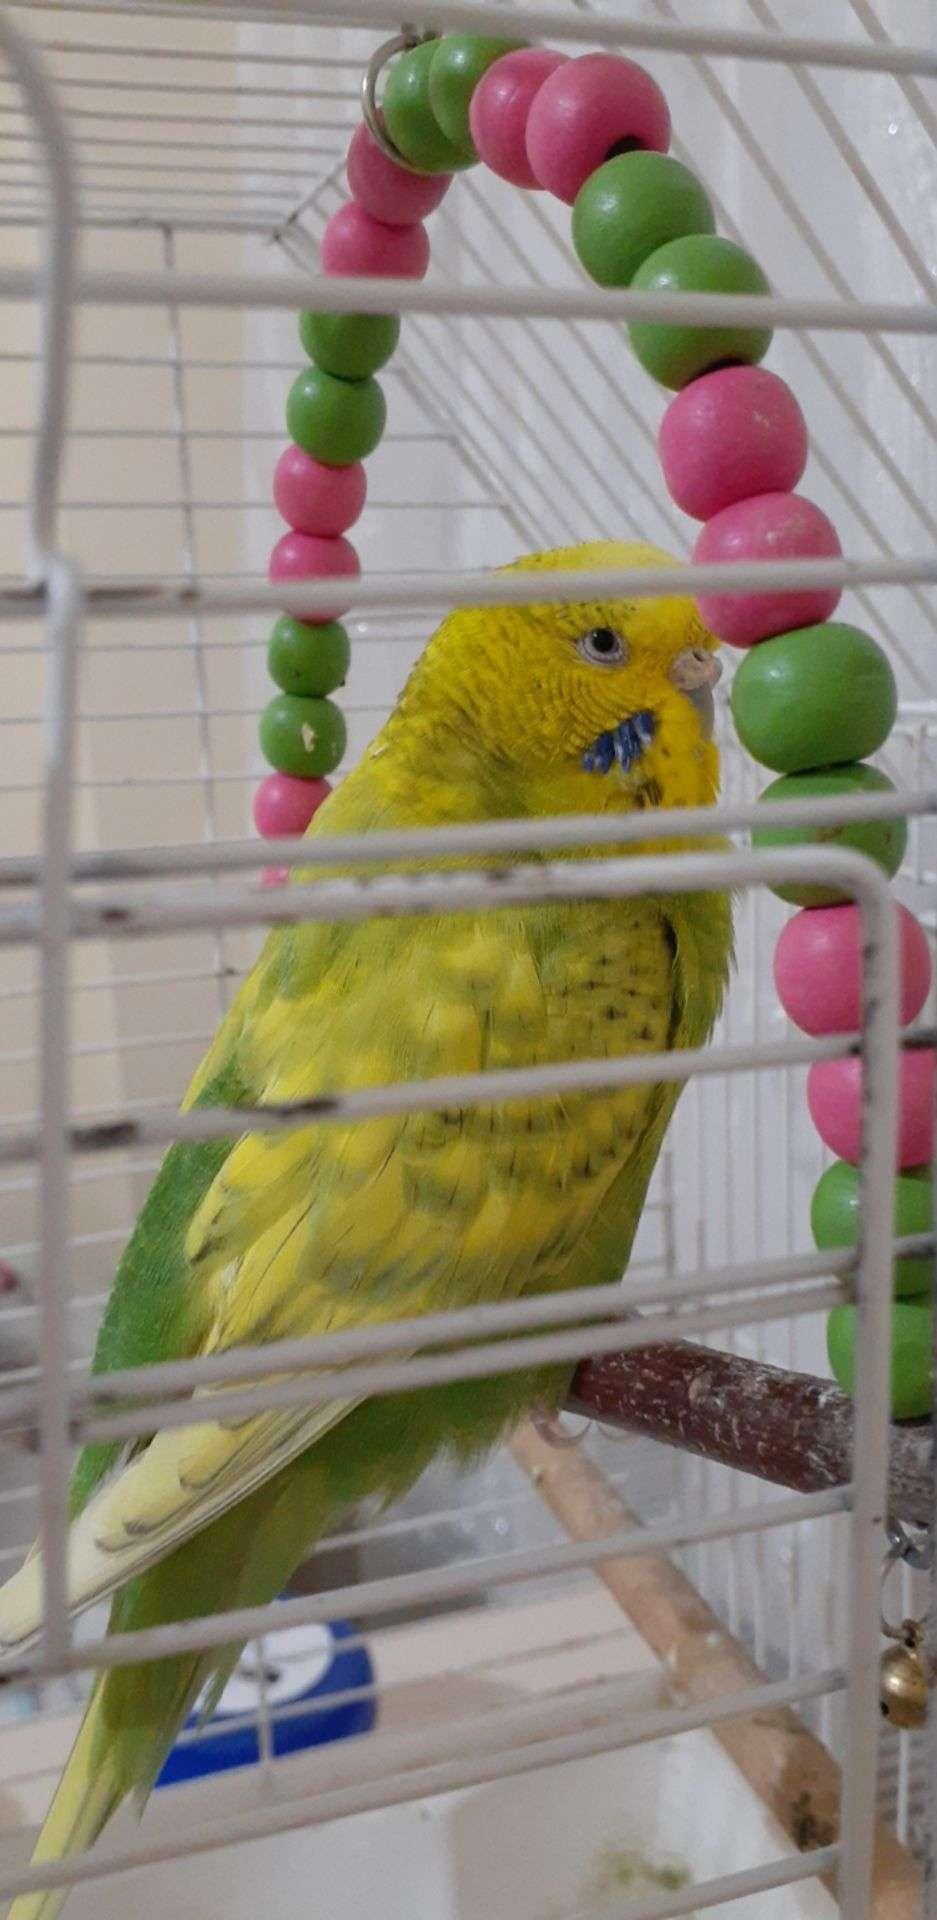 Depremden sonra kaybolan evcil kuş